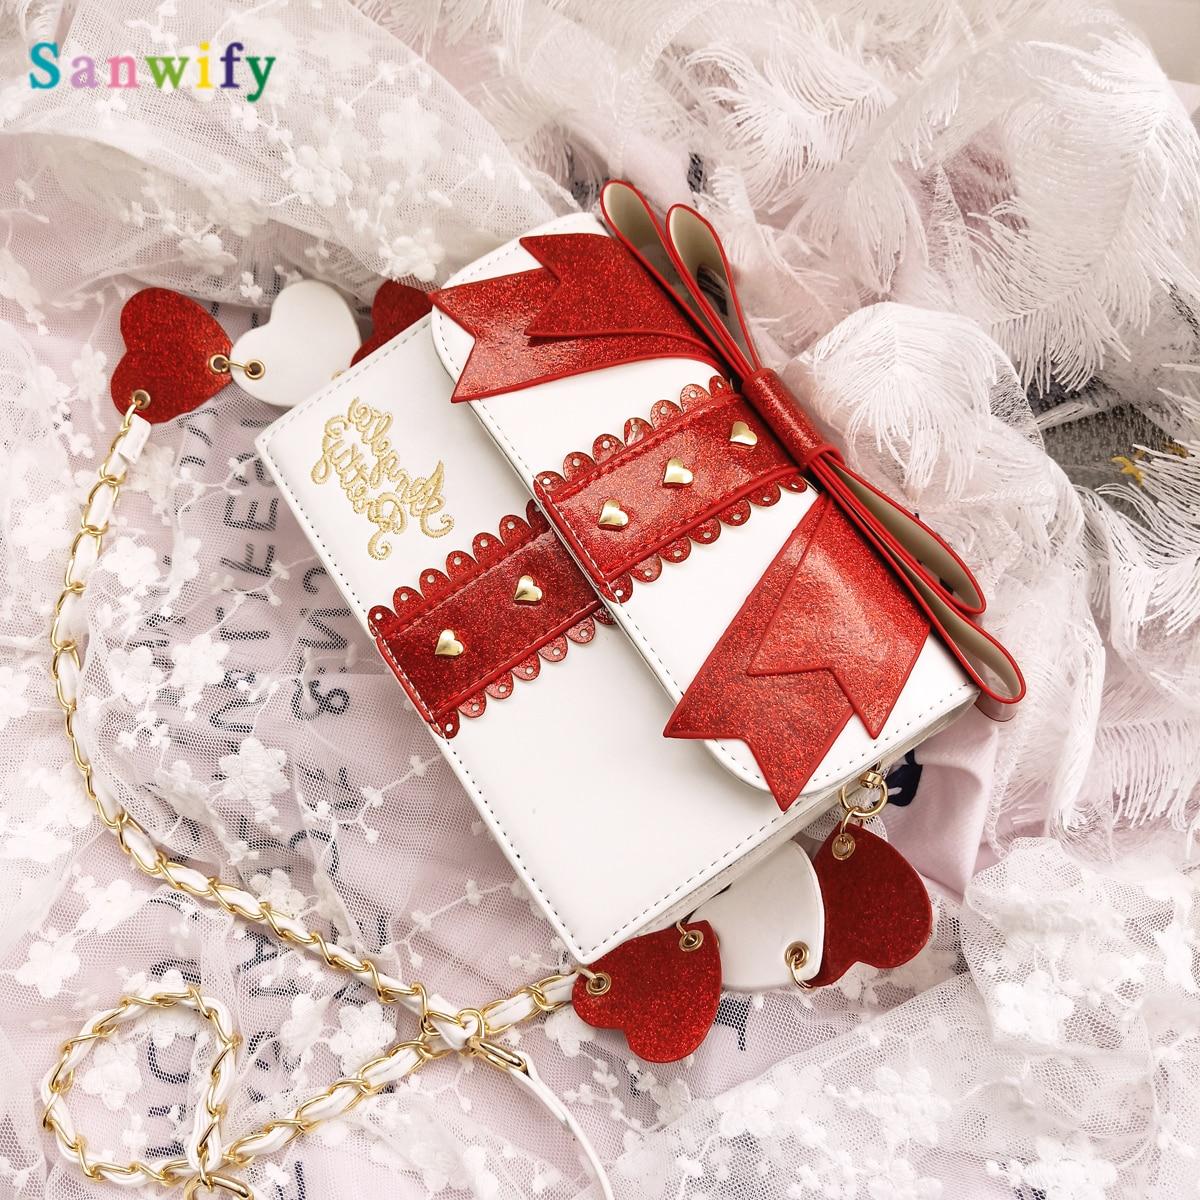 Luo Lita lolita lazo de amor slant pequeño bolso chica bolso de hombro Bolsa de silicona para alimentos, 12 unidades/juego, bolsa esmerilada de silicona PEVA, bolsa reutilizable para mantener los alimentos frescos, bolsa con cierre, bolsa de frutas a prueba de fugas